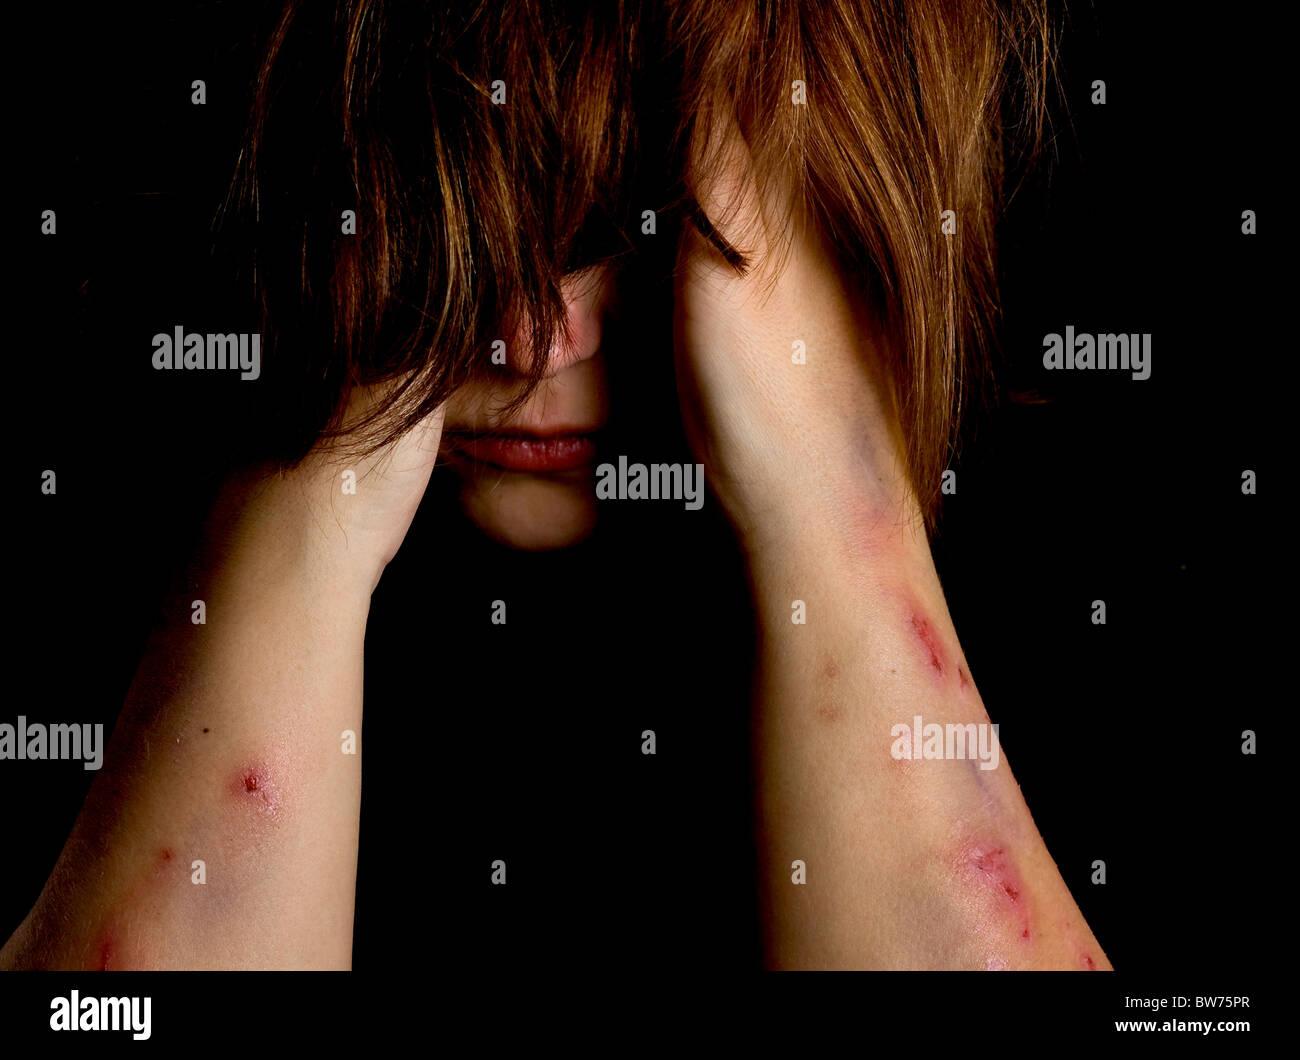 Violence victim - Stock Image